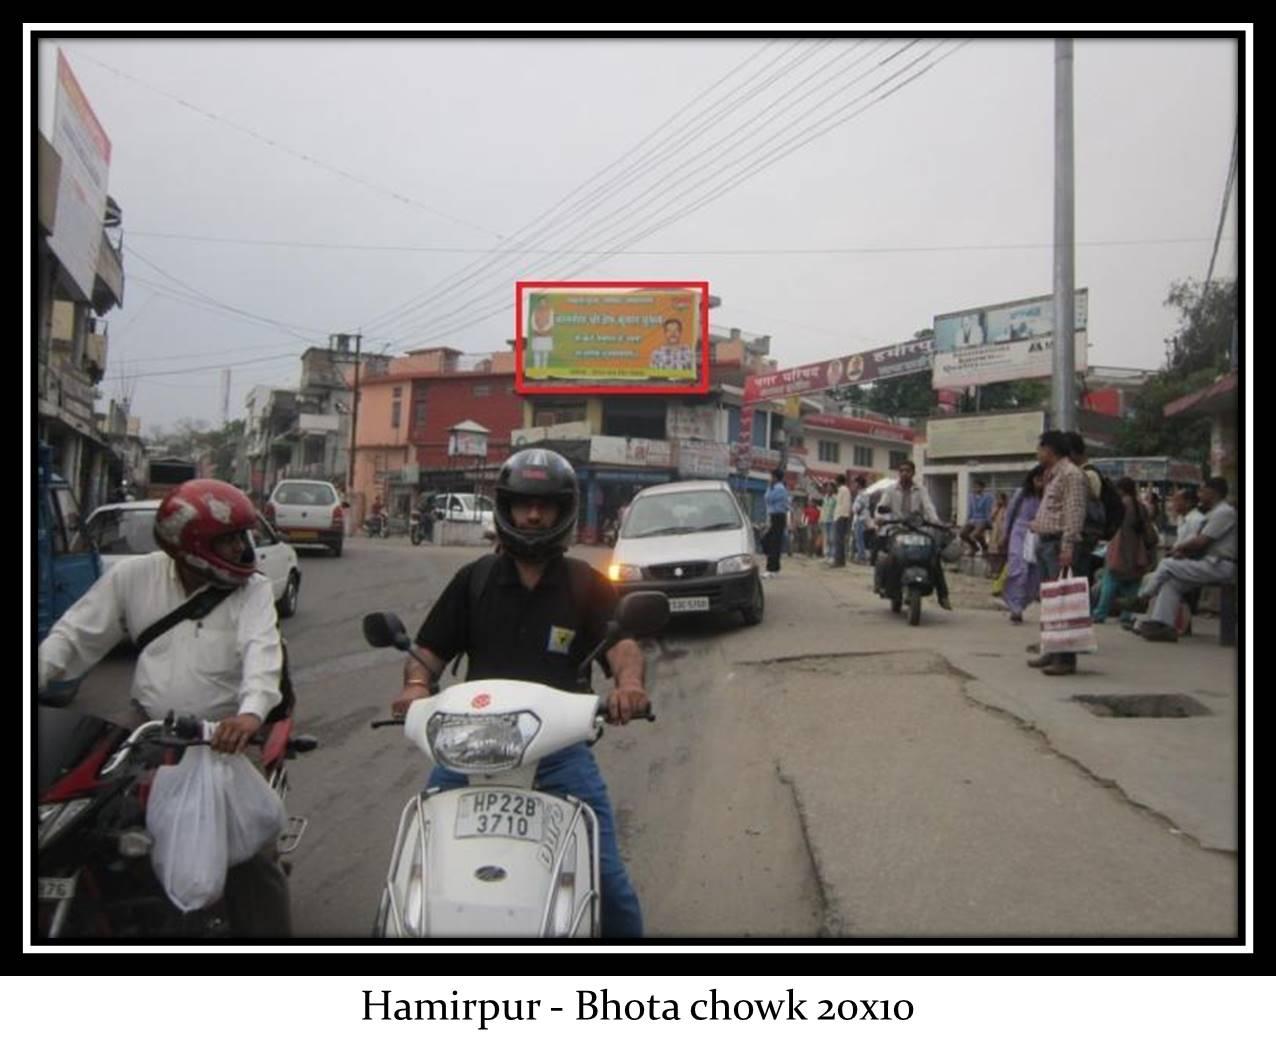 Bhota chowk, Hamirpur